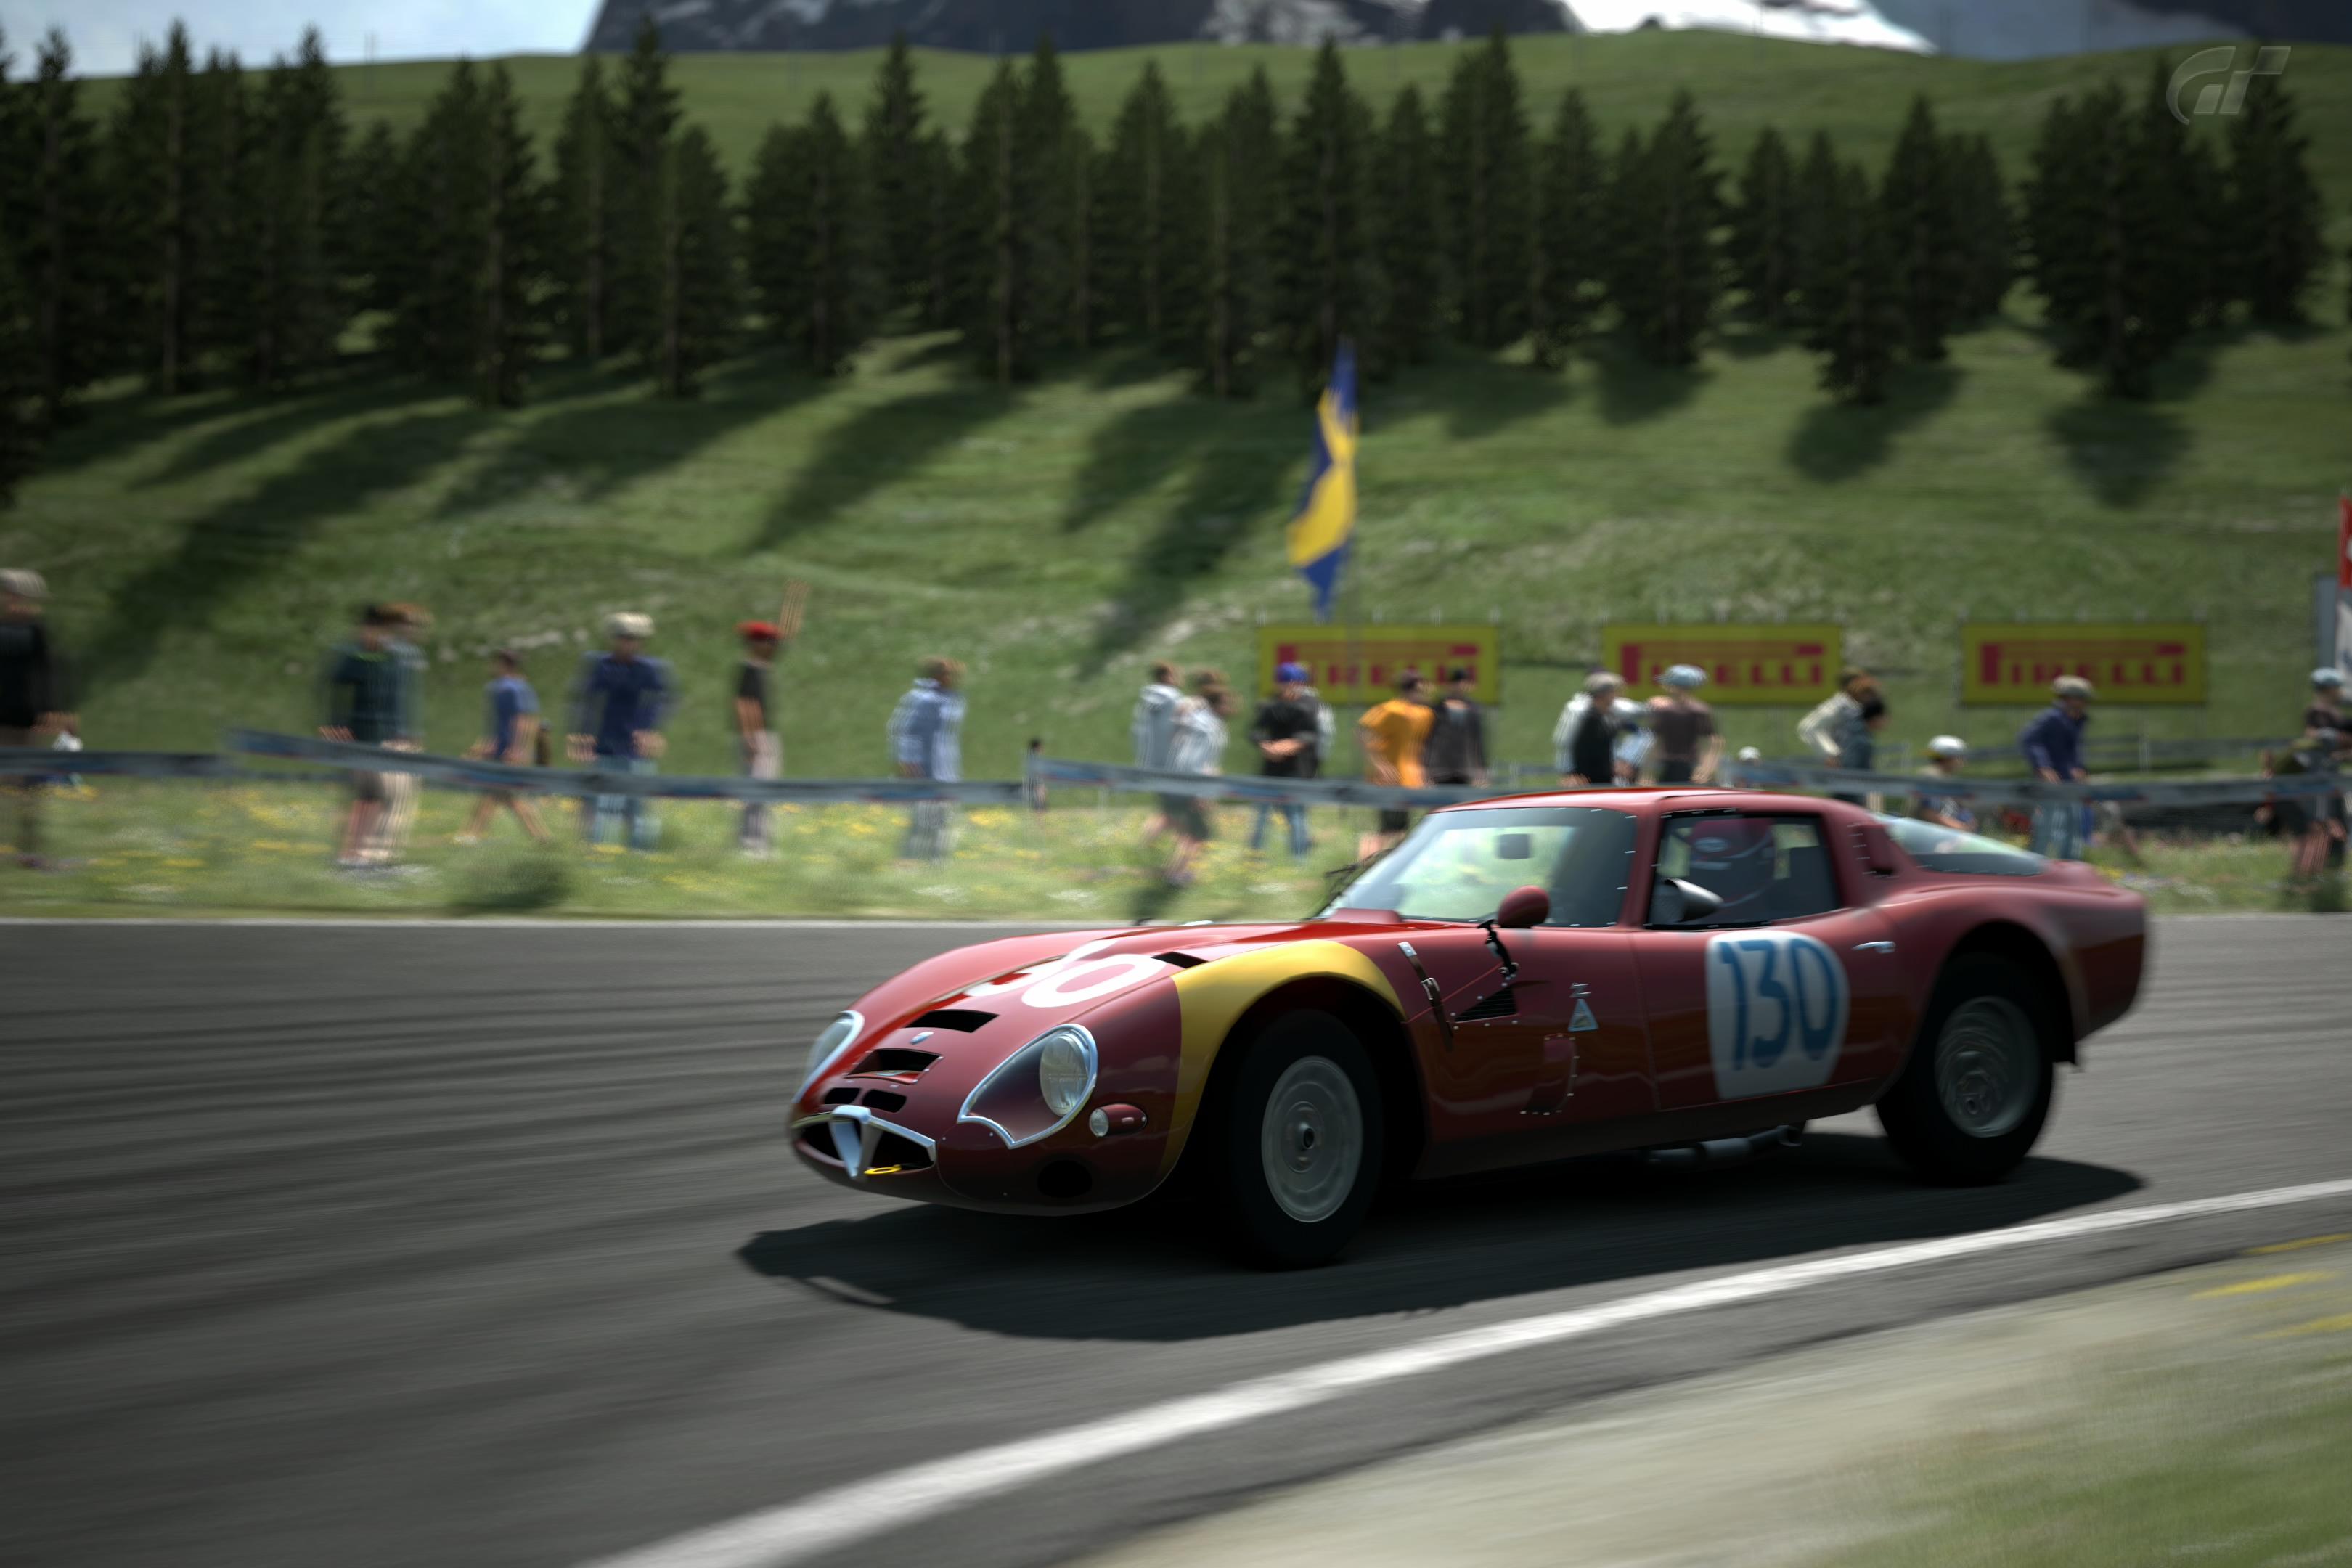 Alfa Giulia TZ2, Auto racing, Car, Outdoor, Race car, HQ Photo